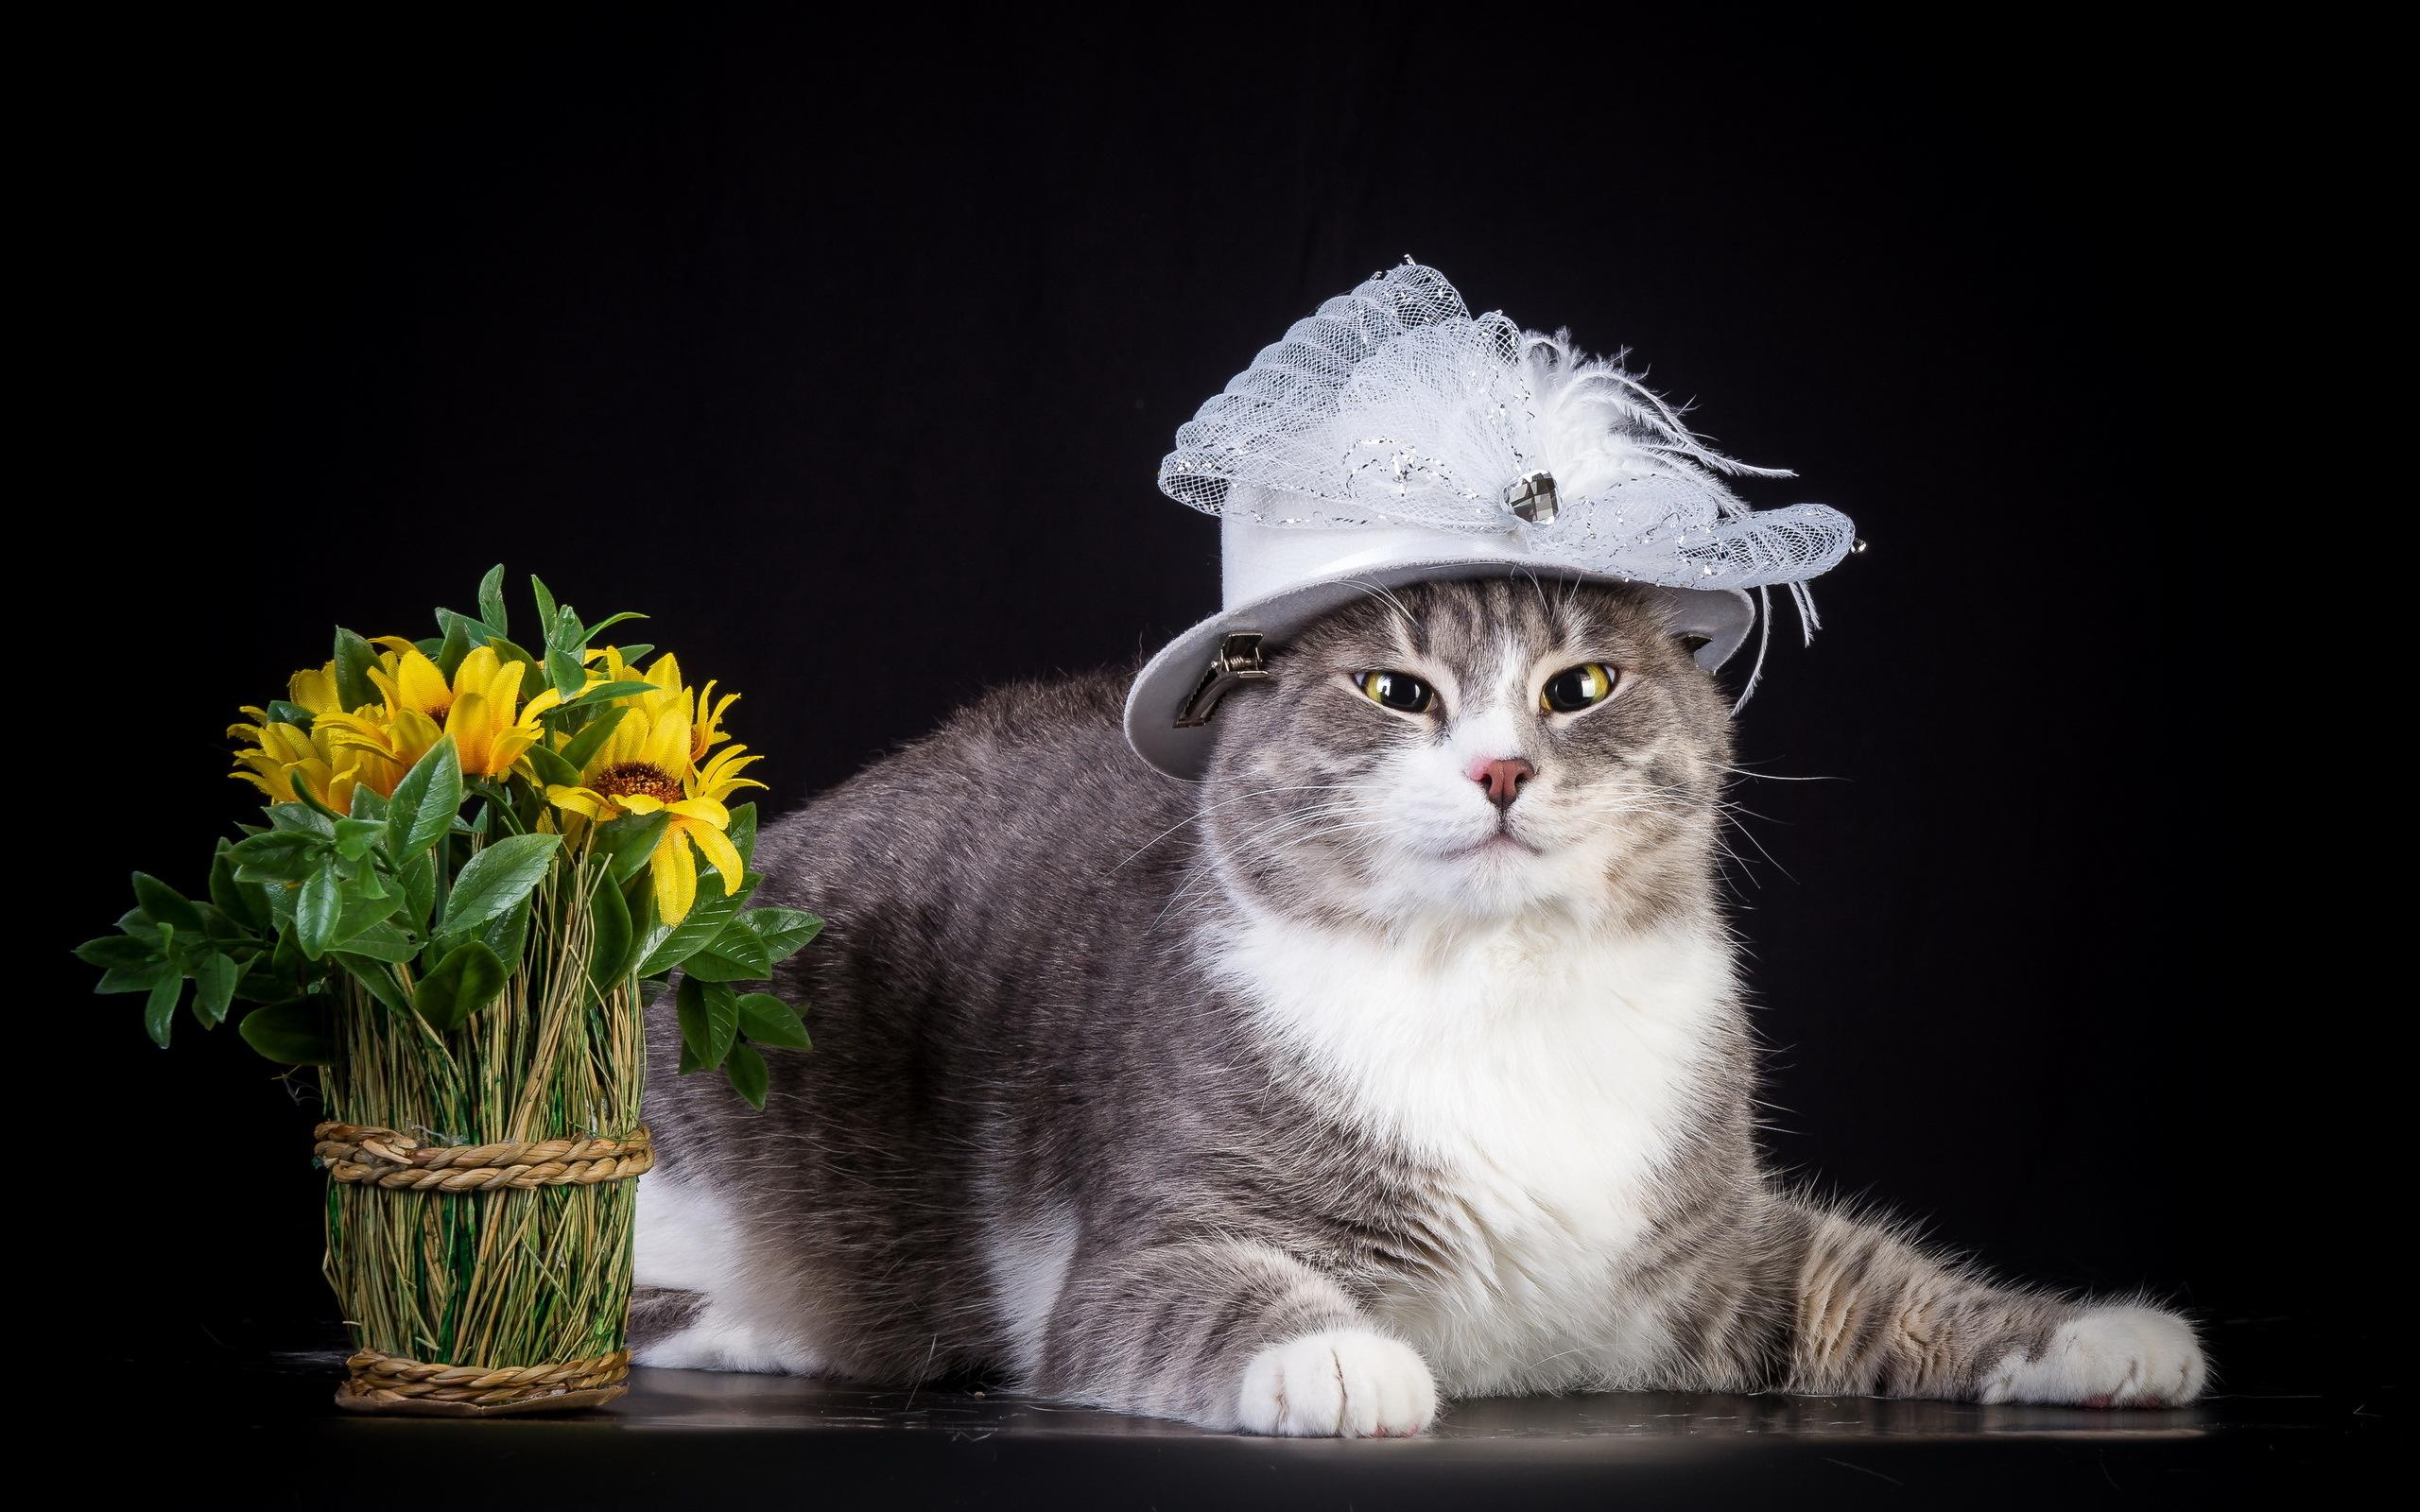 Cat in the Hat Wallpaper 2560x1600